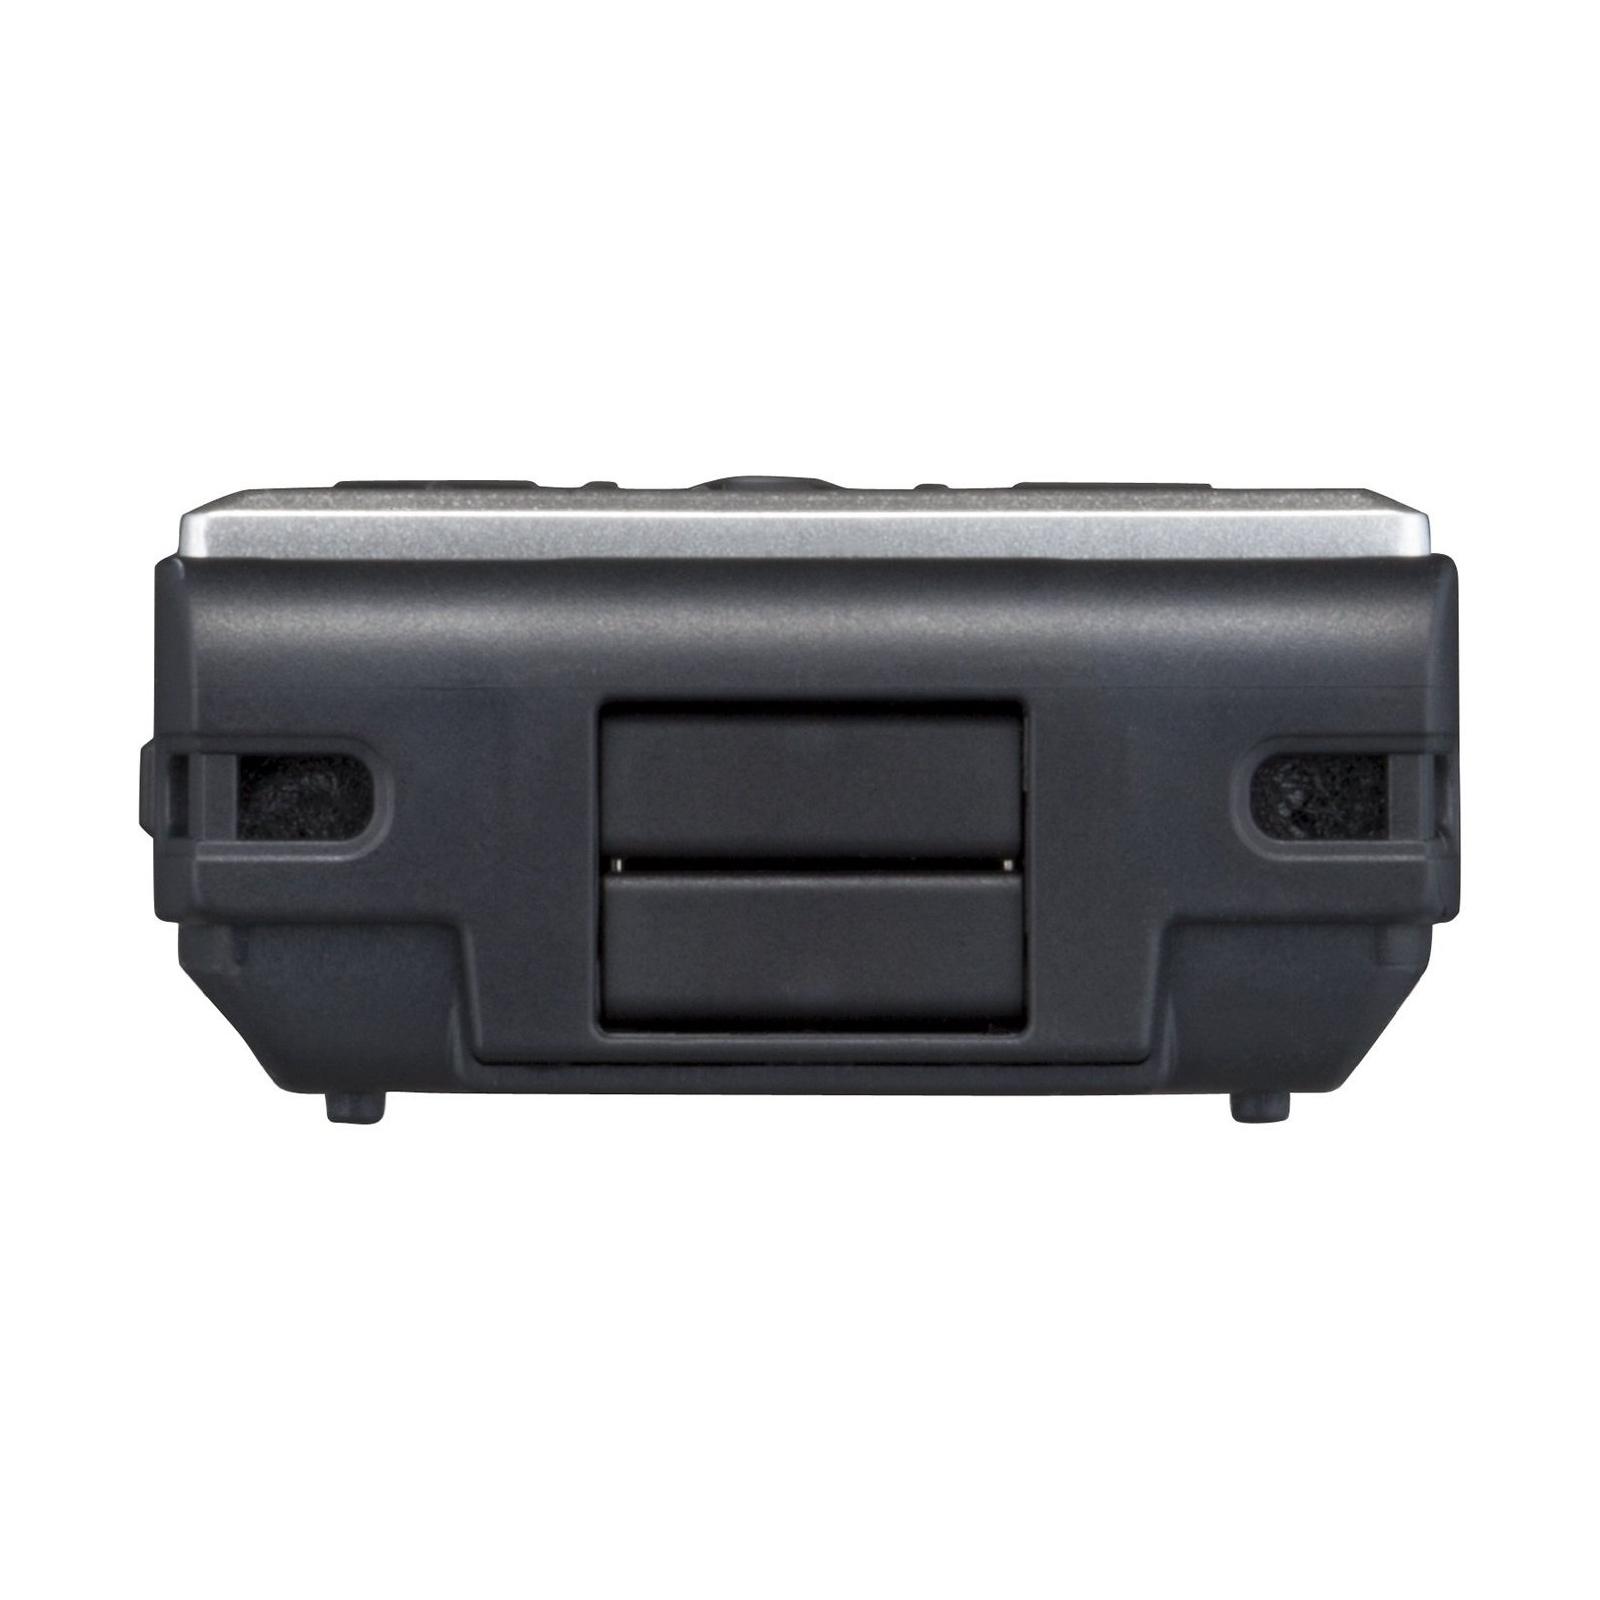 Цифровой диктофон OLYMPUS WS-852 4GB Silver (V415121SE000) изображение 6